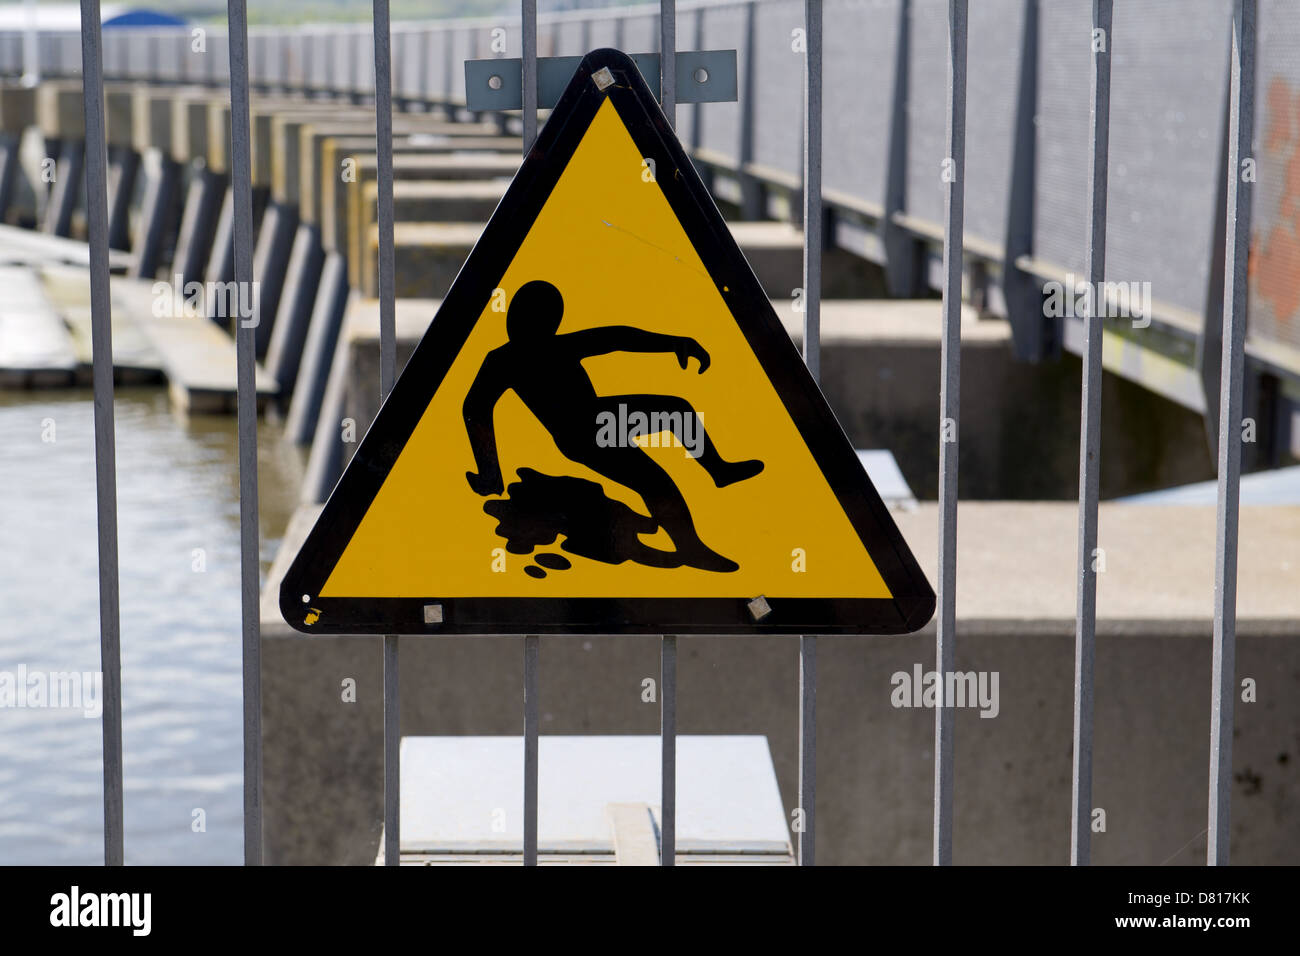 A warning sign indicating a slippery surface near the sluice gates of Cardiff Bay, UK. - Stock Image